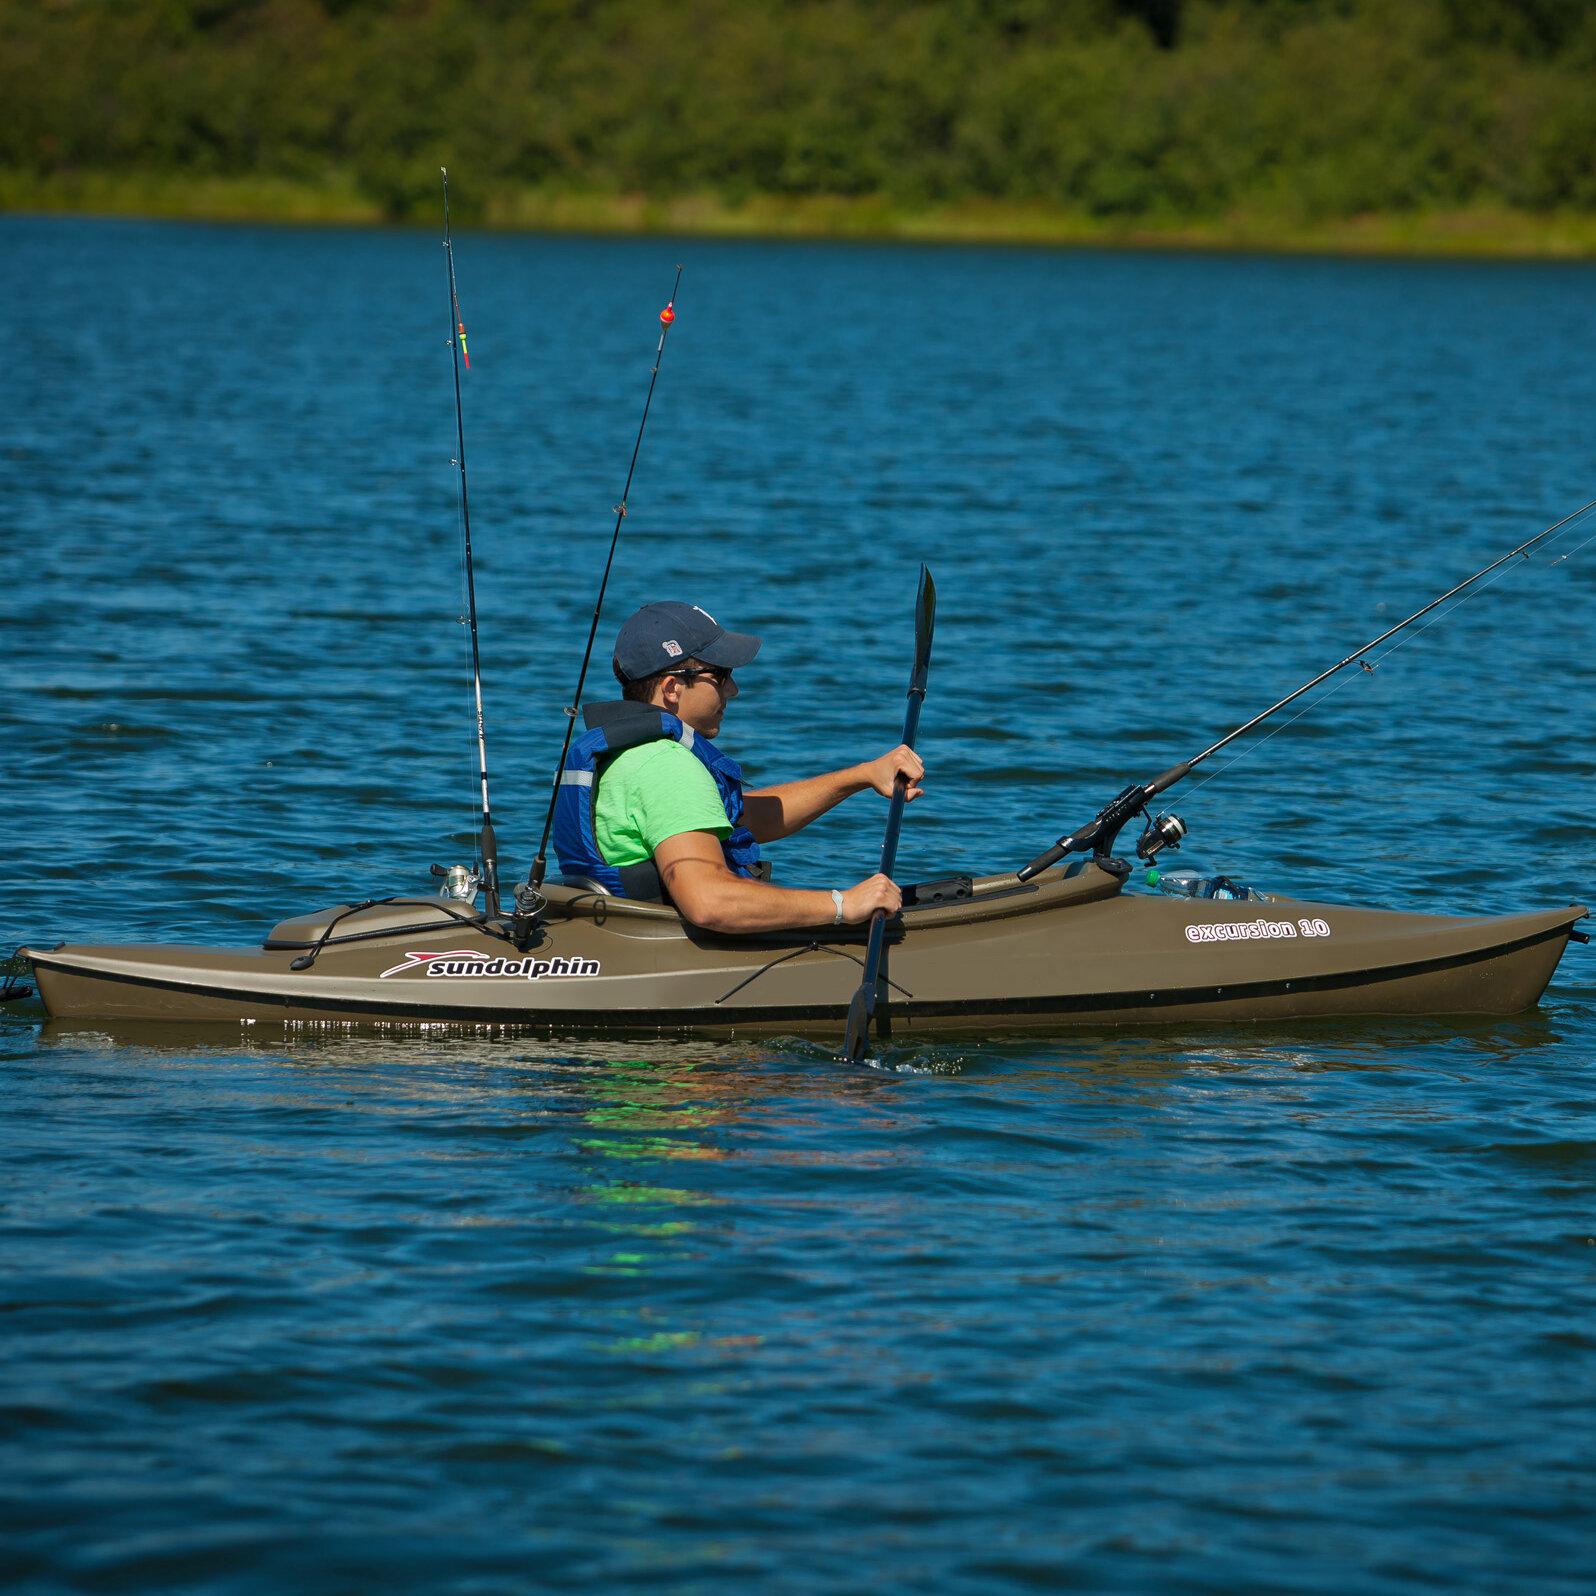 Sun dolphin sun dolphin excursion 10 39 deluxe fishing kayak for 10 fishing kayak